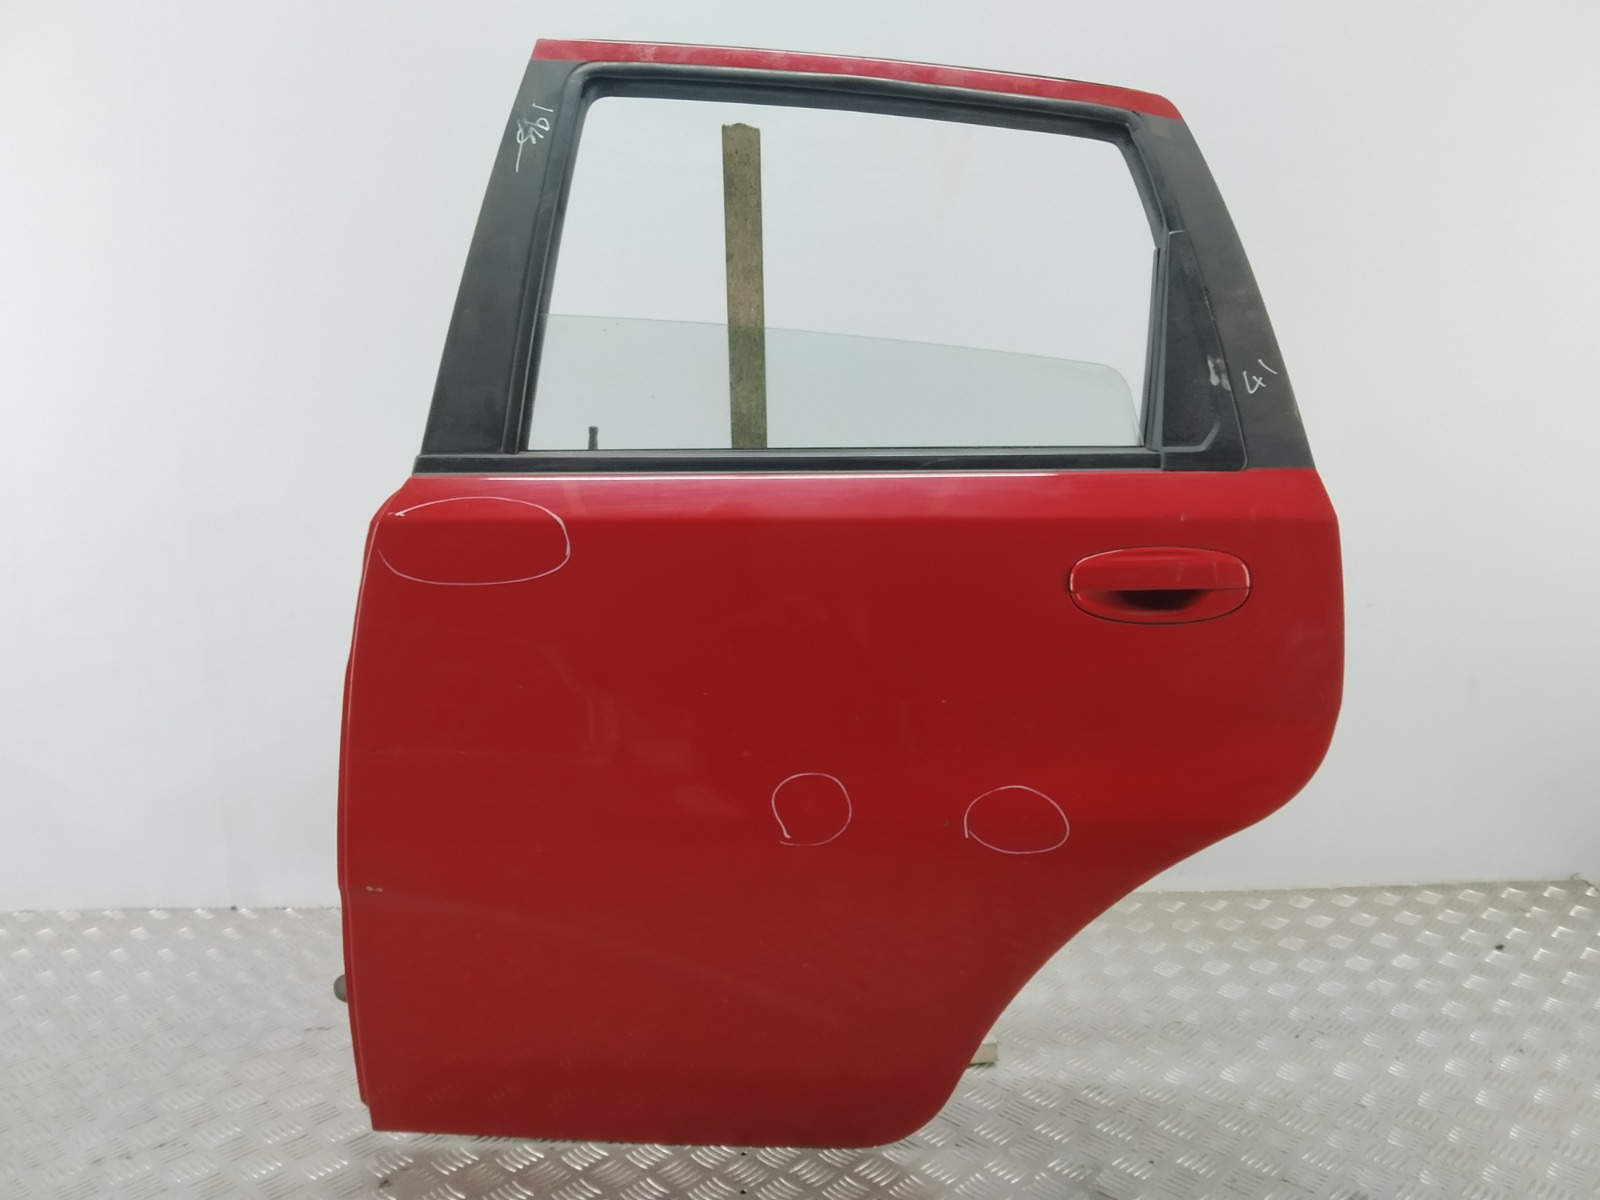 Дверь задняя левая Chevrolet Kalos 1.4 I 2007 (б/у)